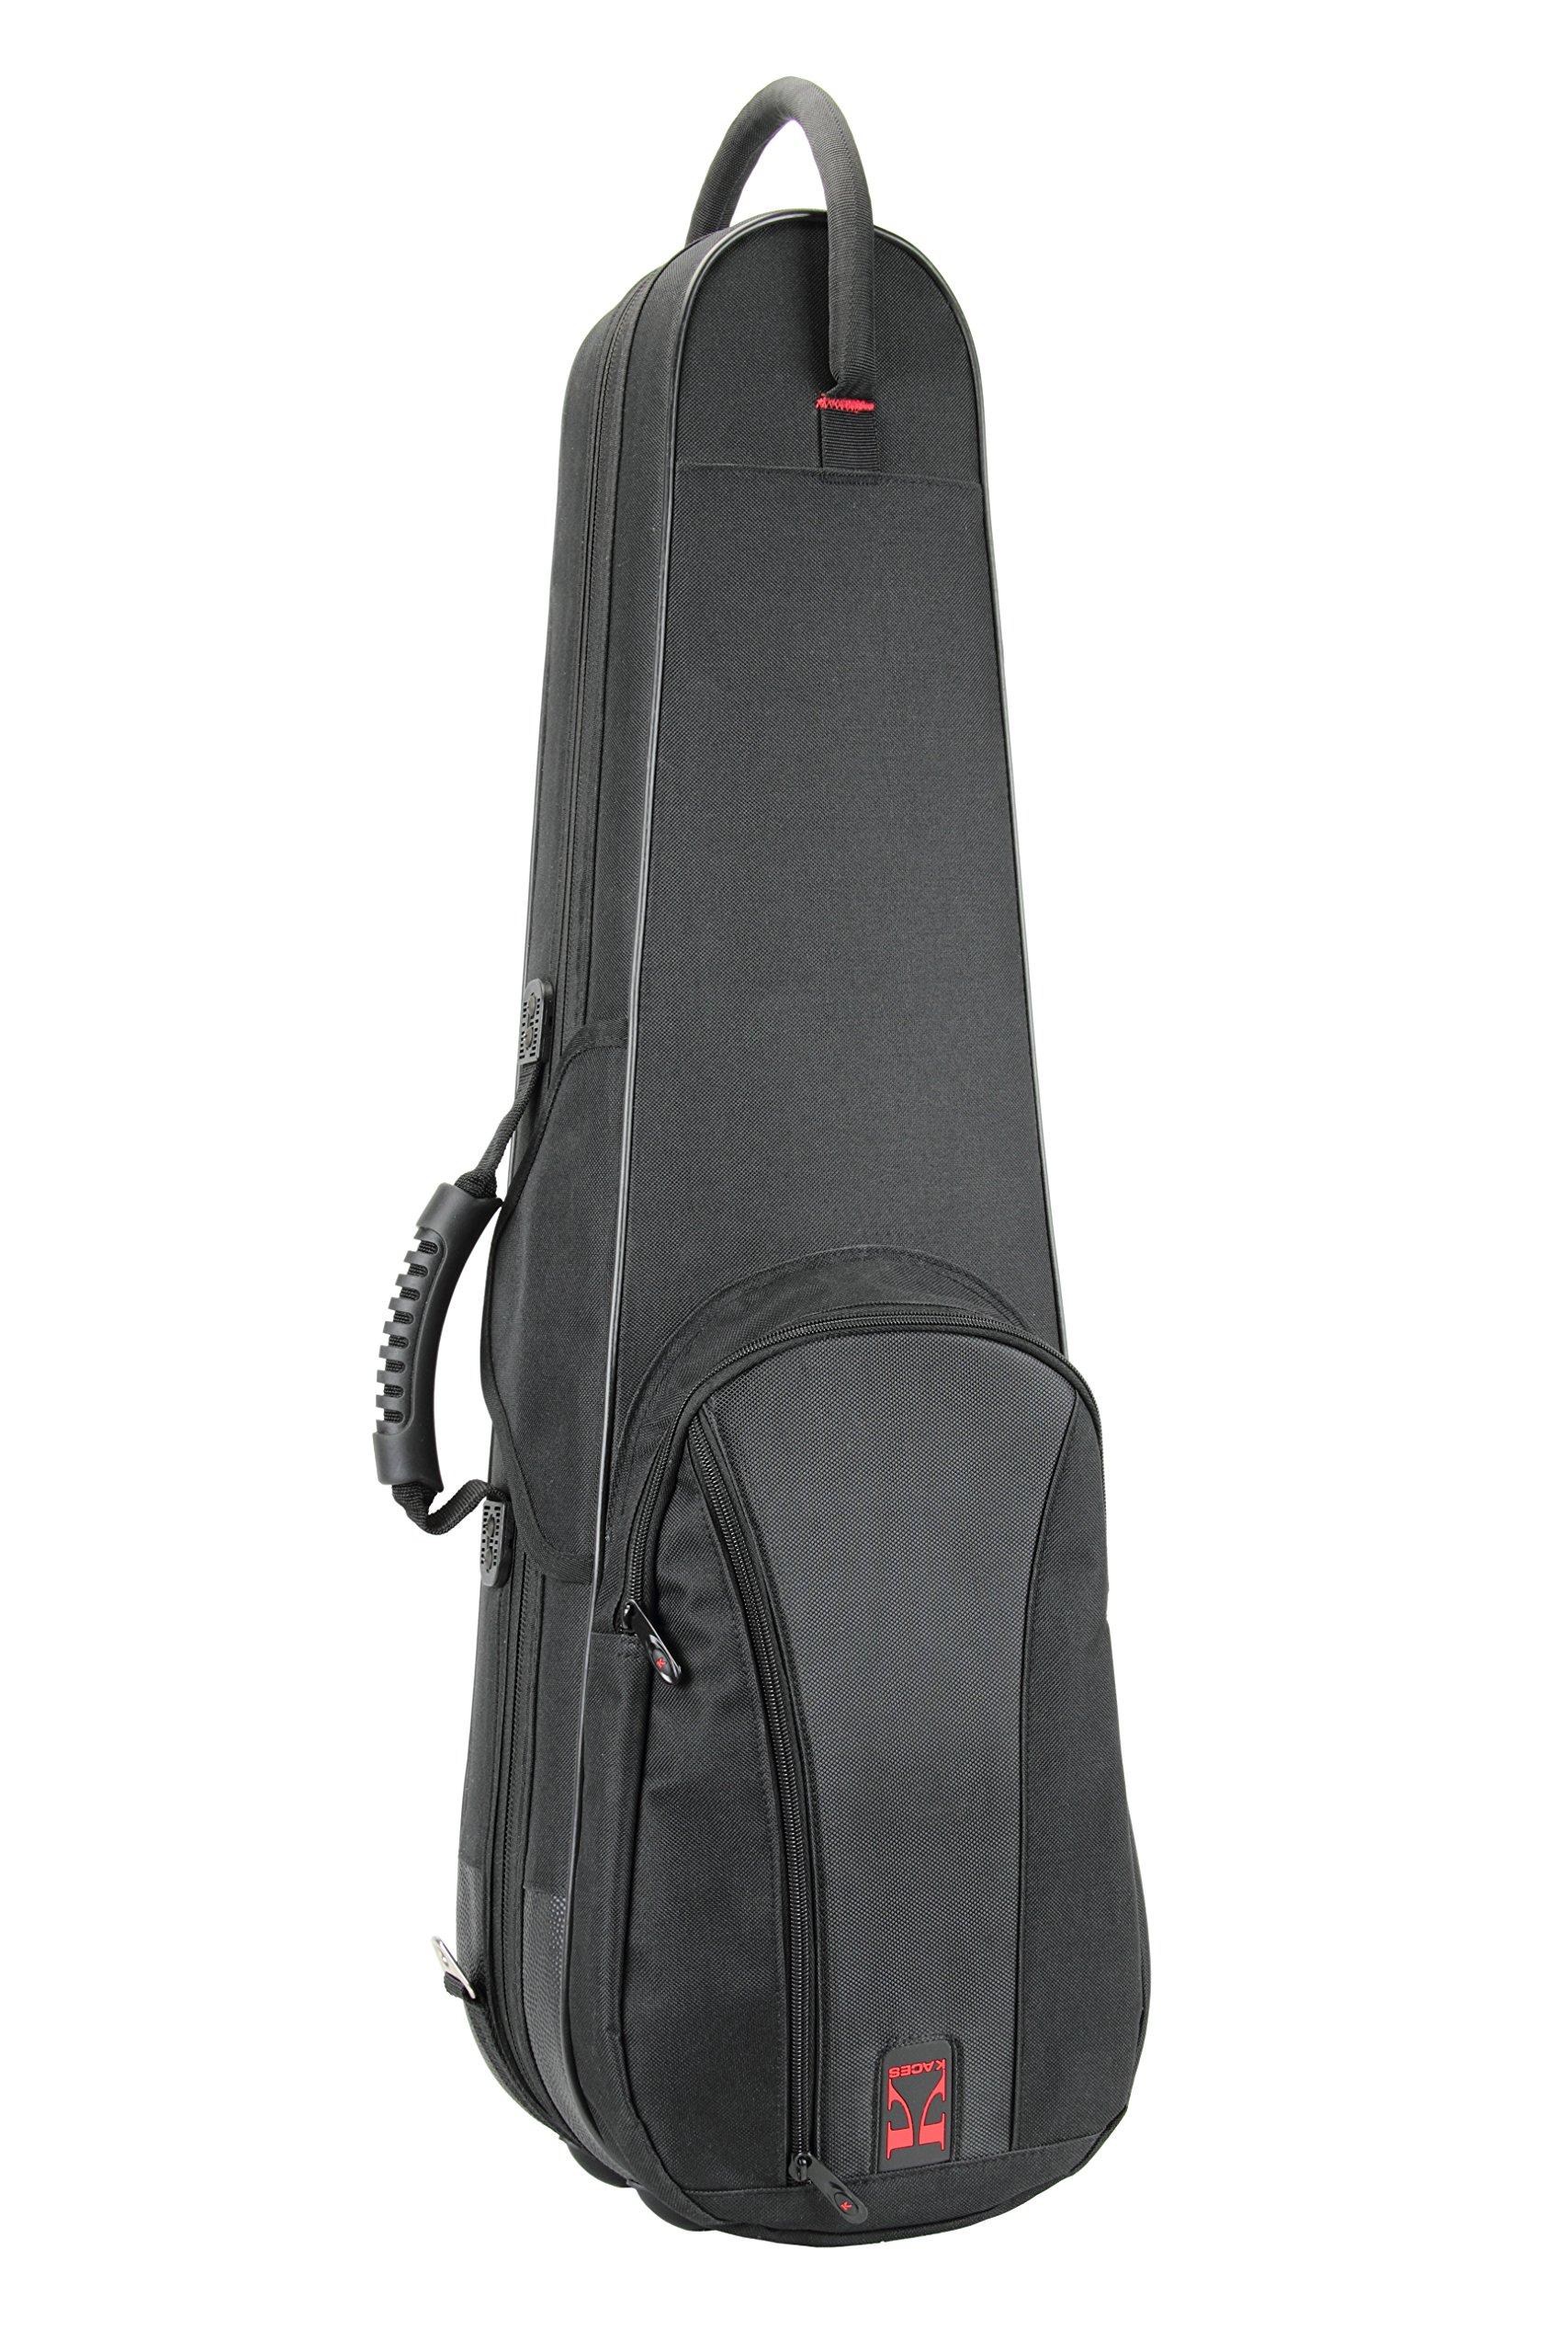 Kaces KBF-VL12 Duet Series Violin Case - 1/2''